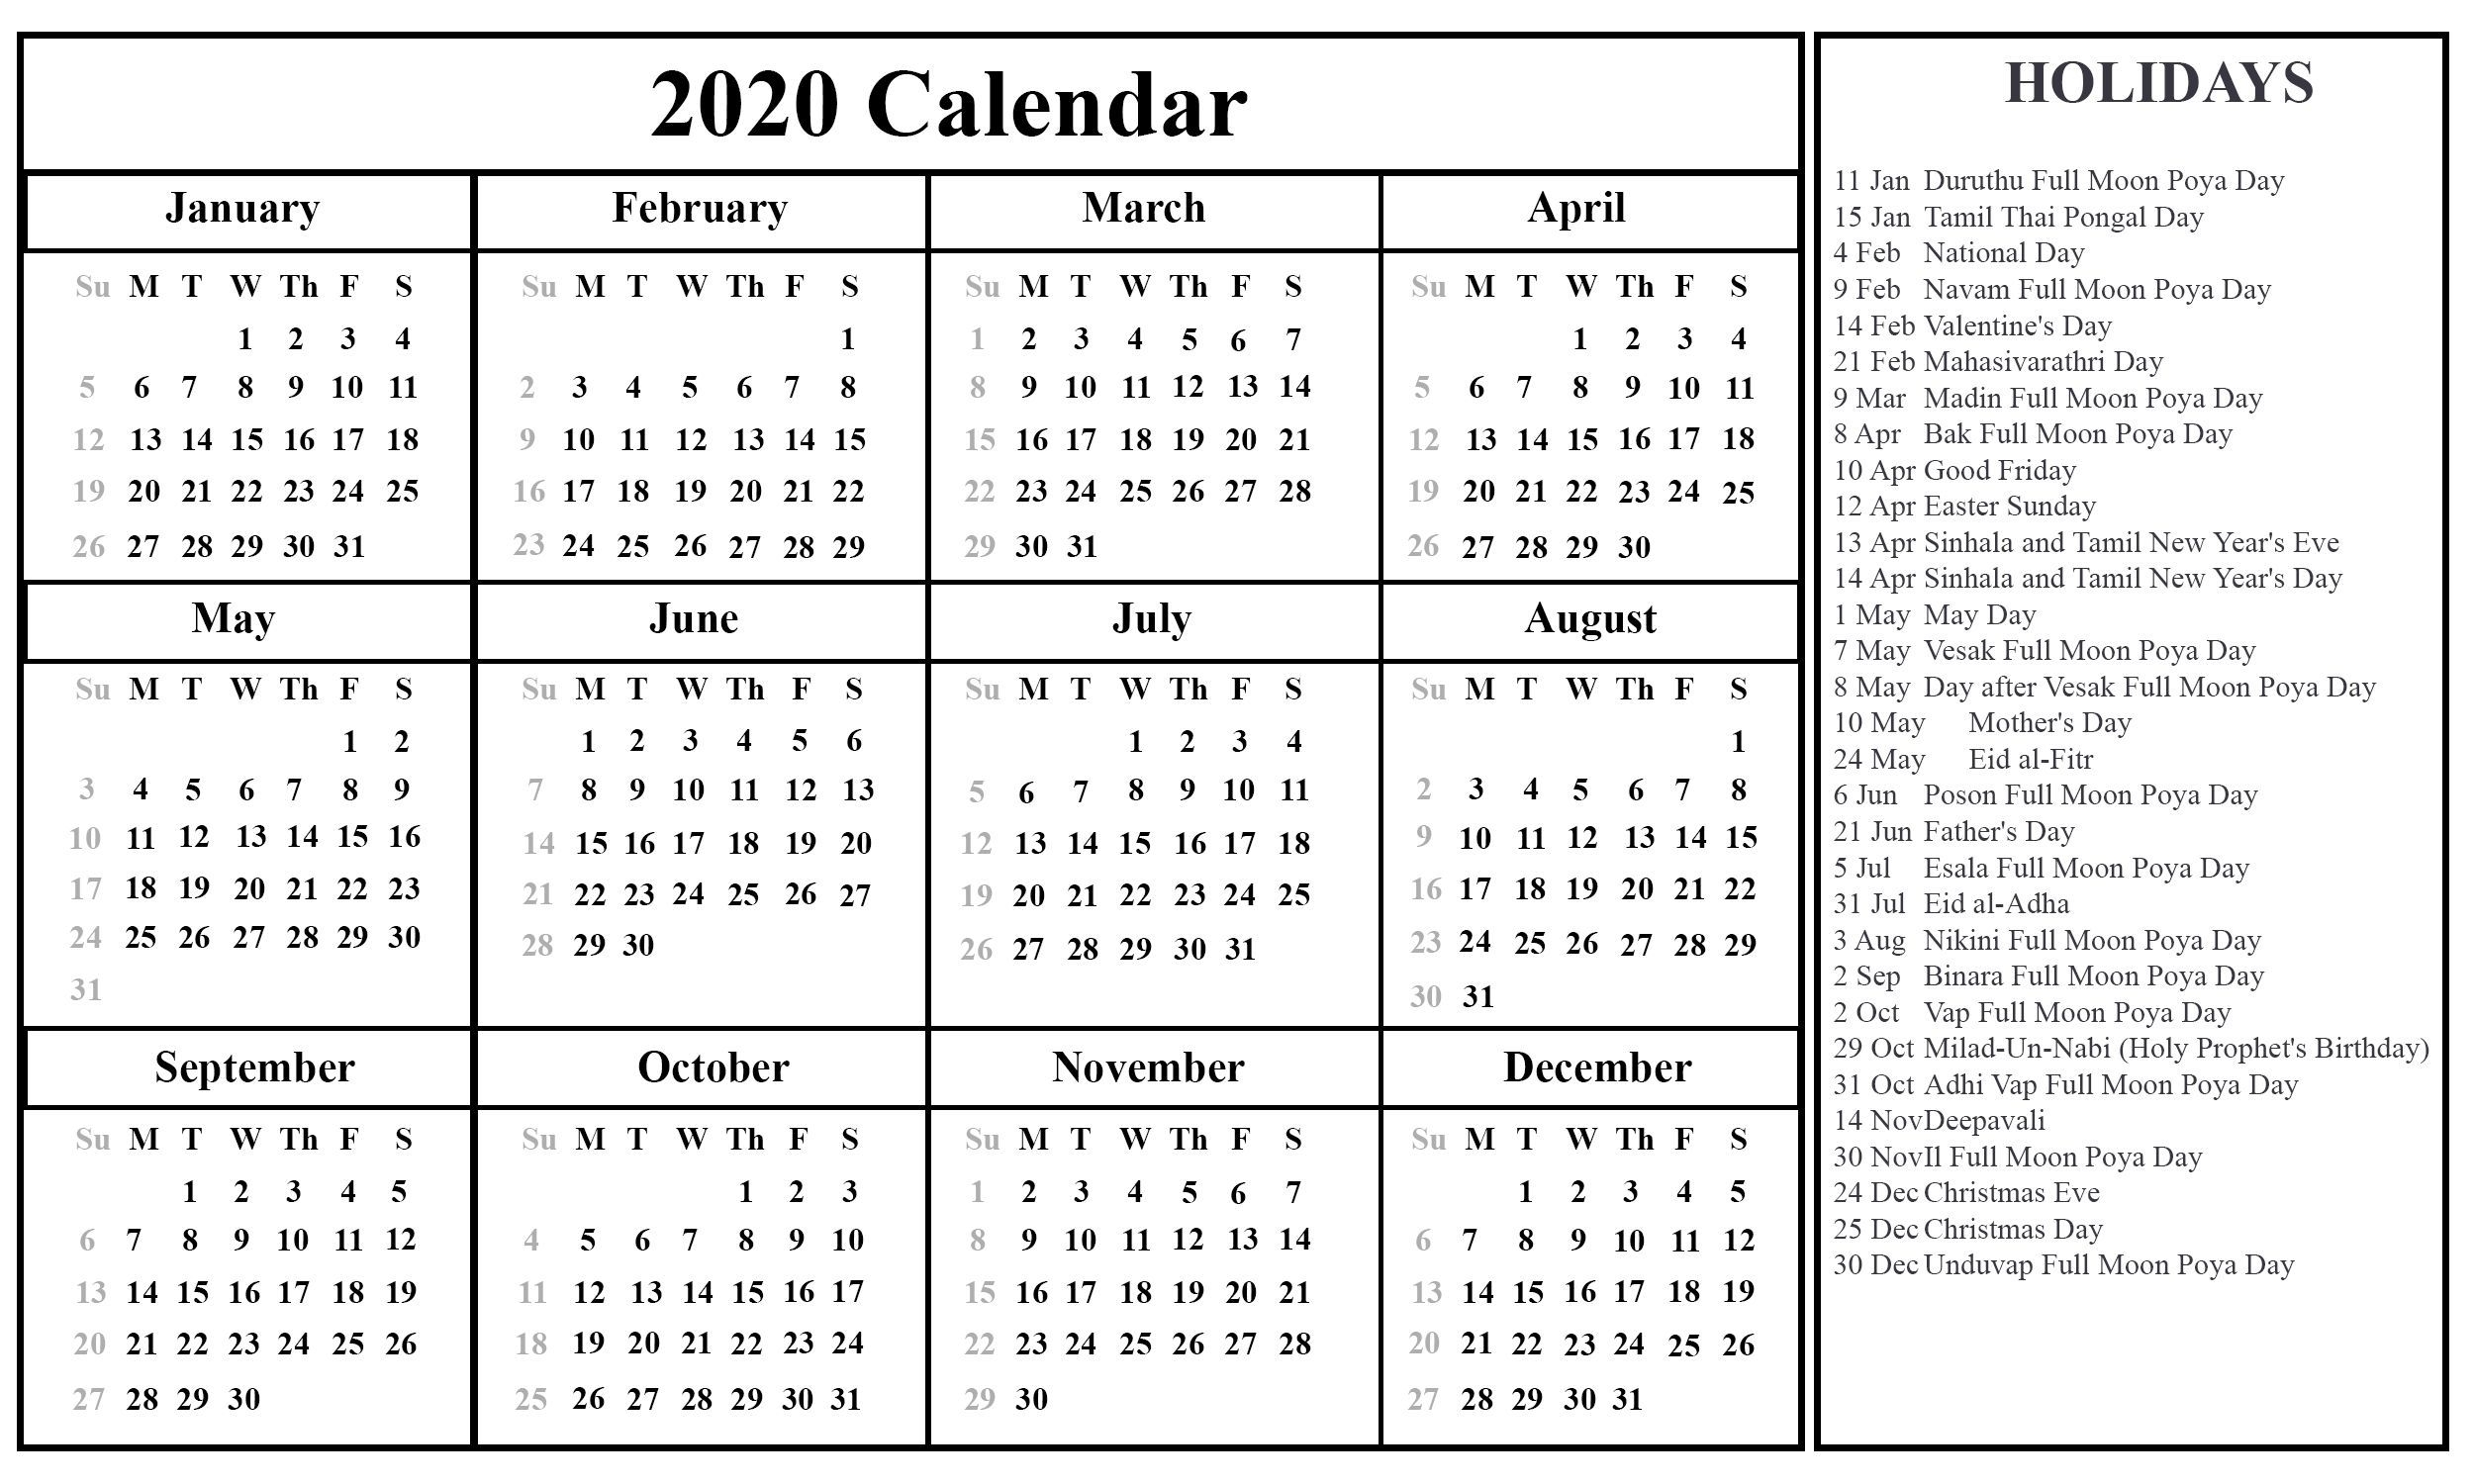 Calendar 2021 Sri Lanka Holidays In 2020 | Printable